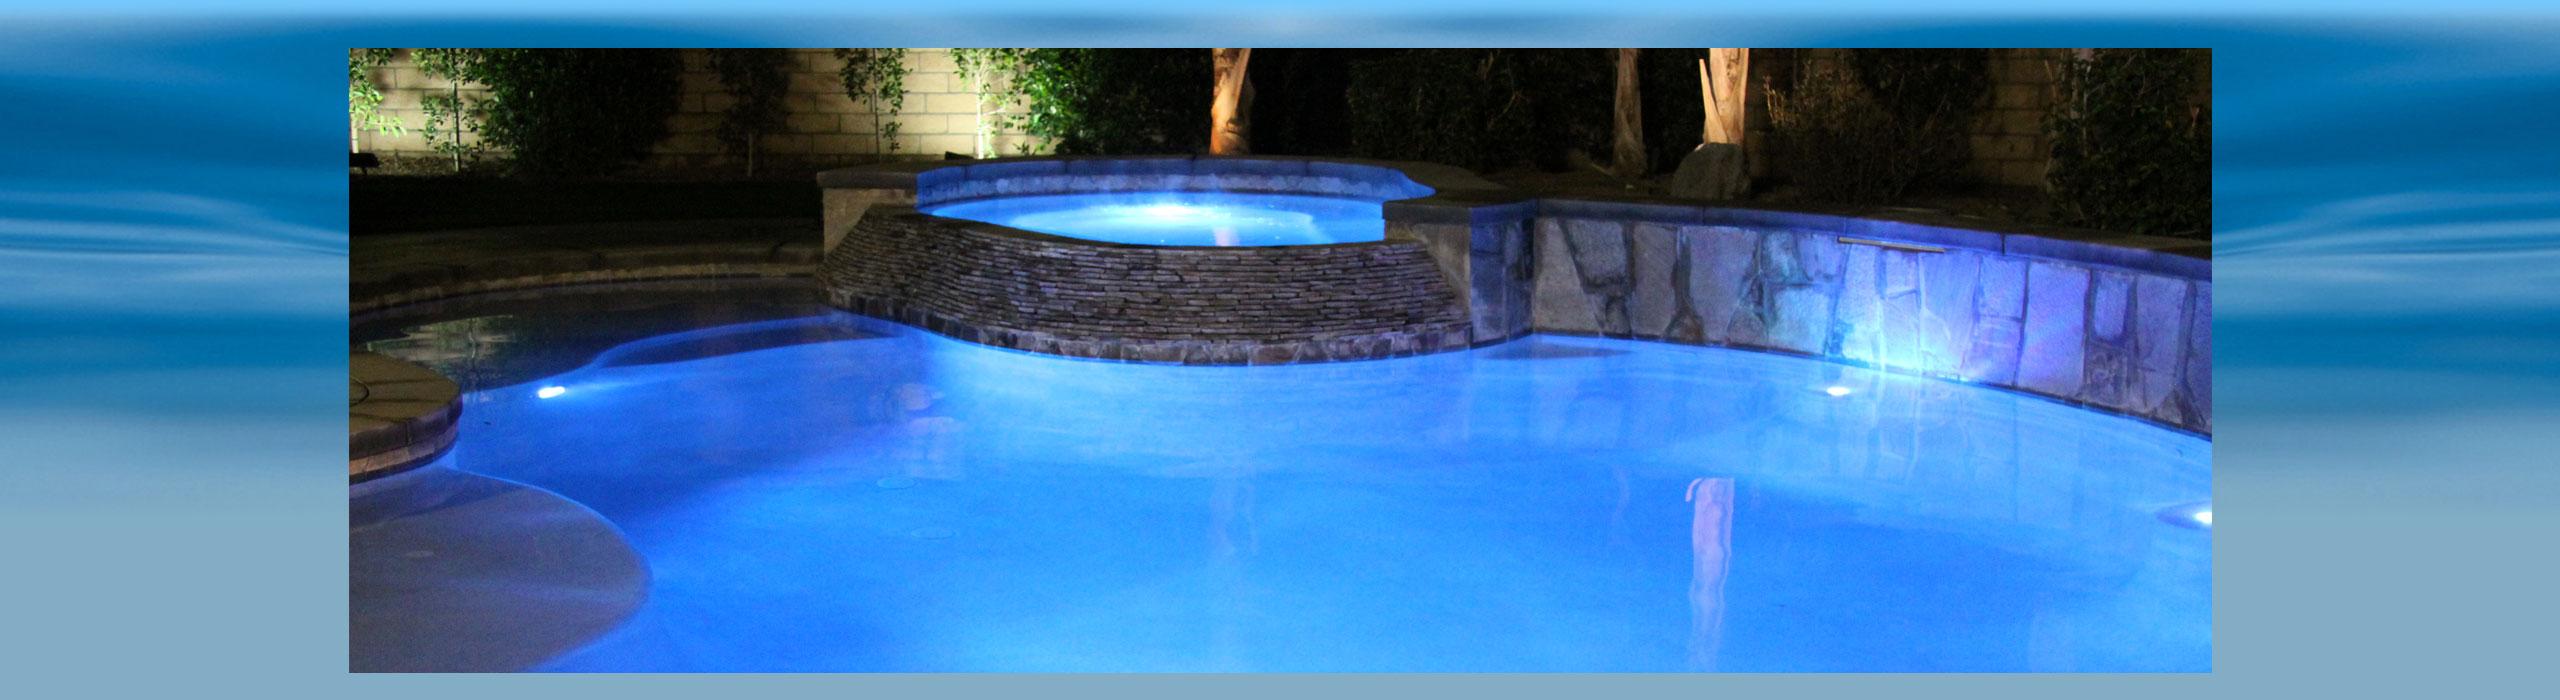 U Build It Pools Swimming Pool Construction Sacramento